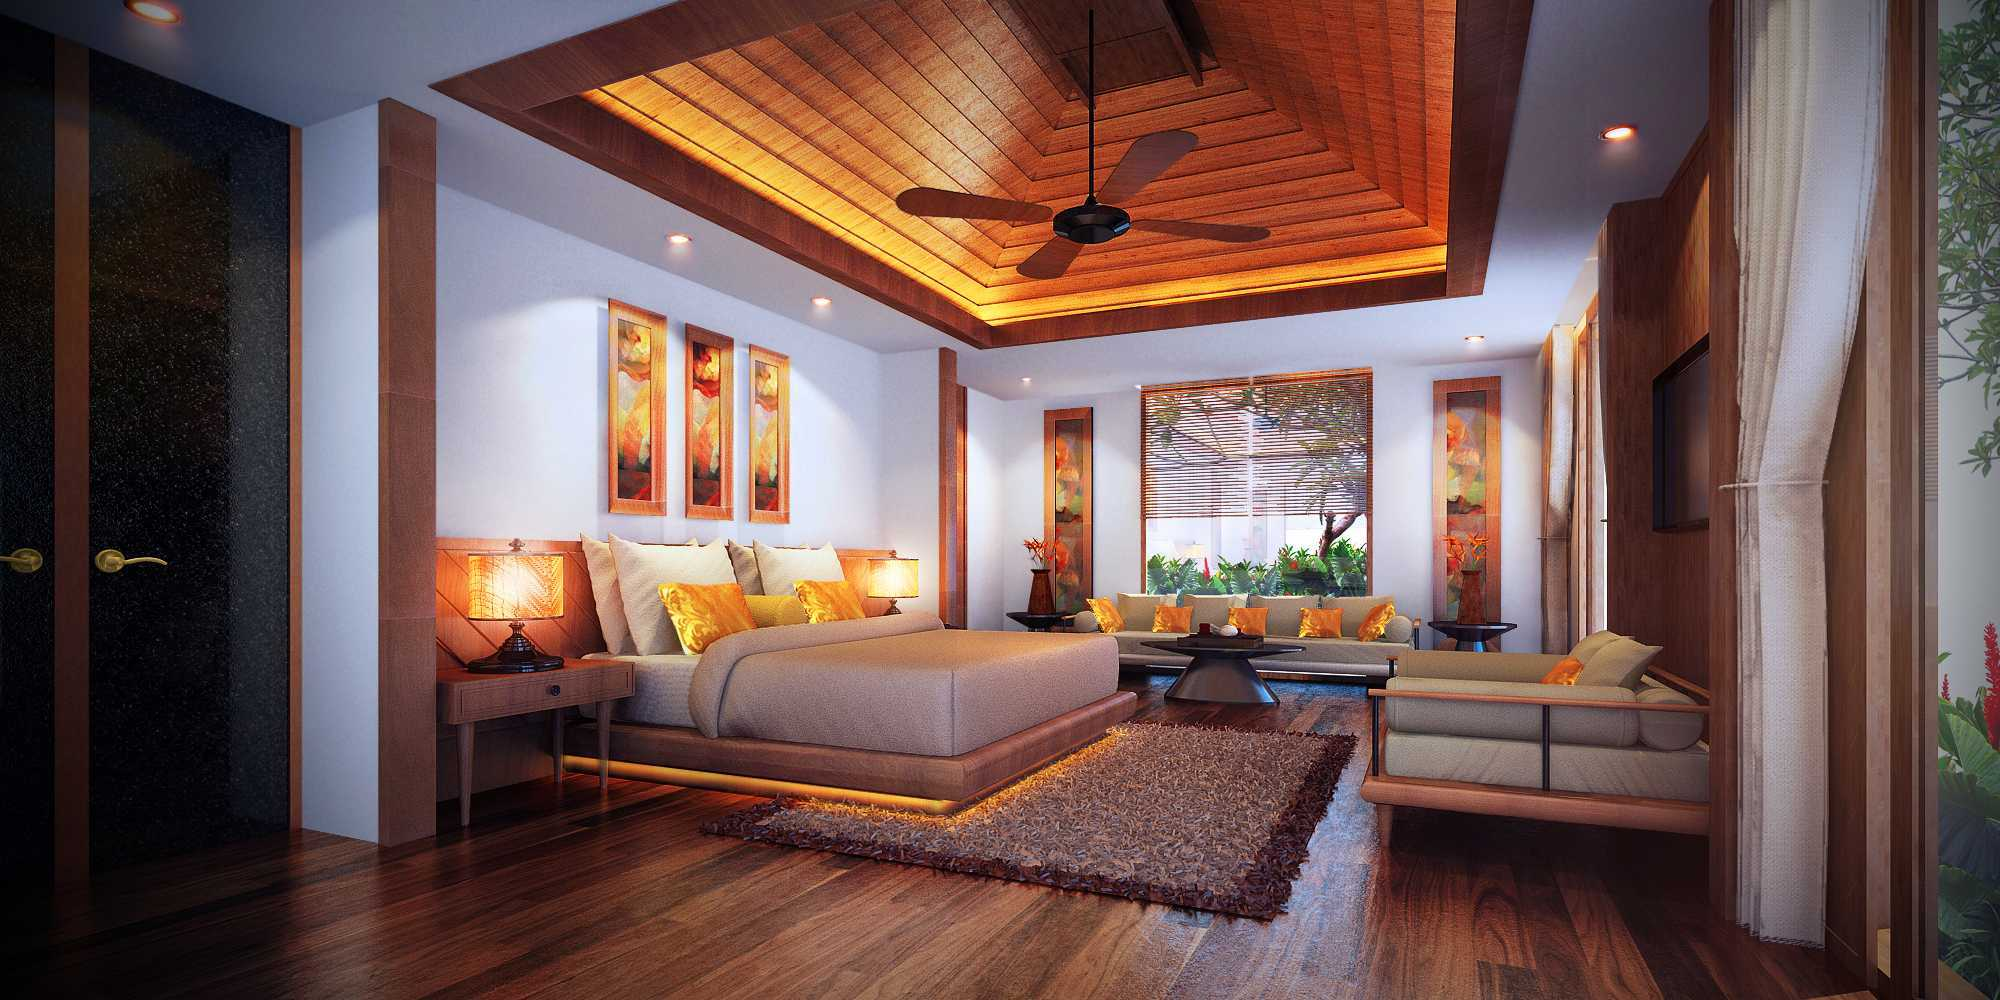 Icds Architect Pejeng Villa Bali Bali Master-Bedroom   13929